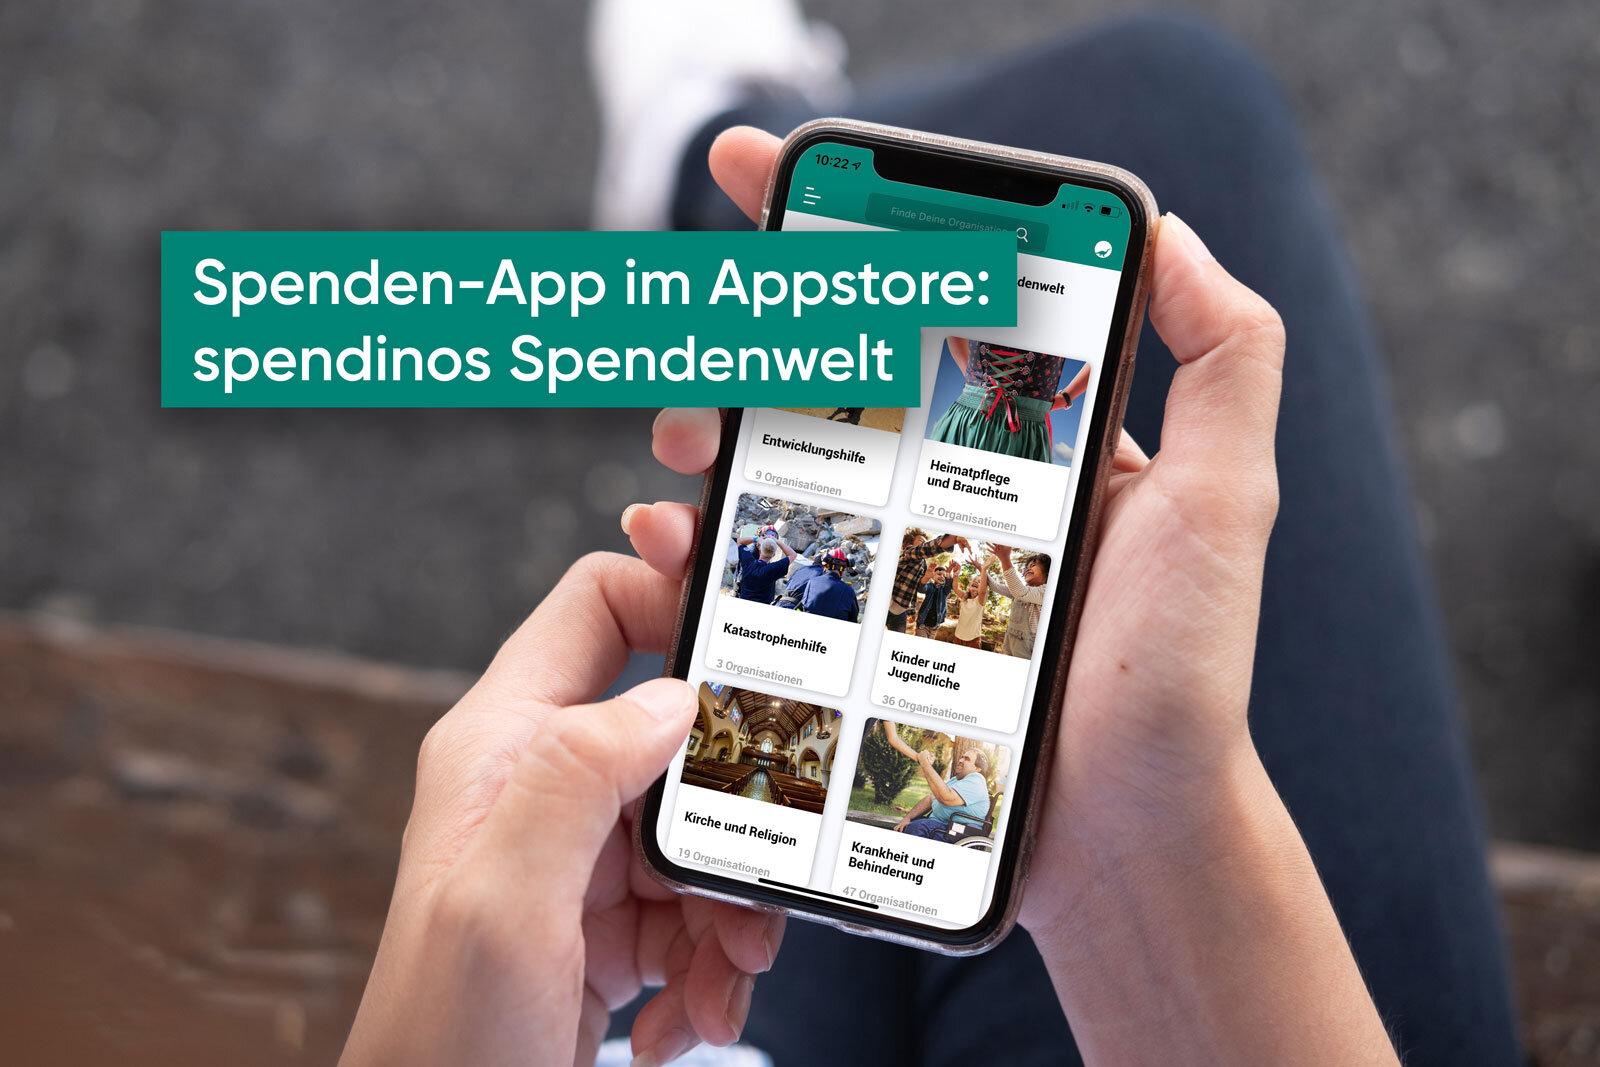 Spenden-App im Appstore: Spendinos Spendenwelt